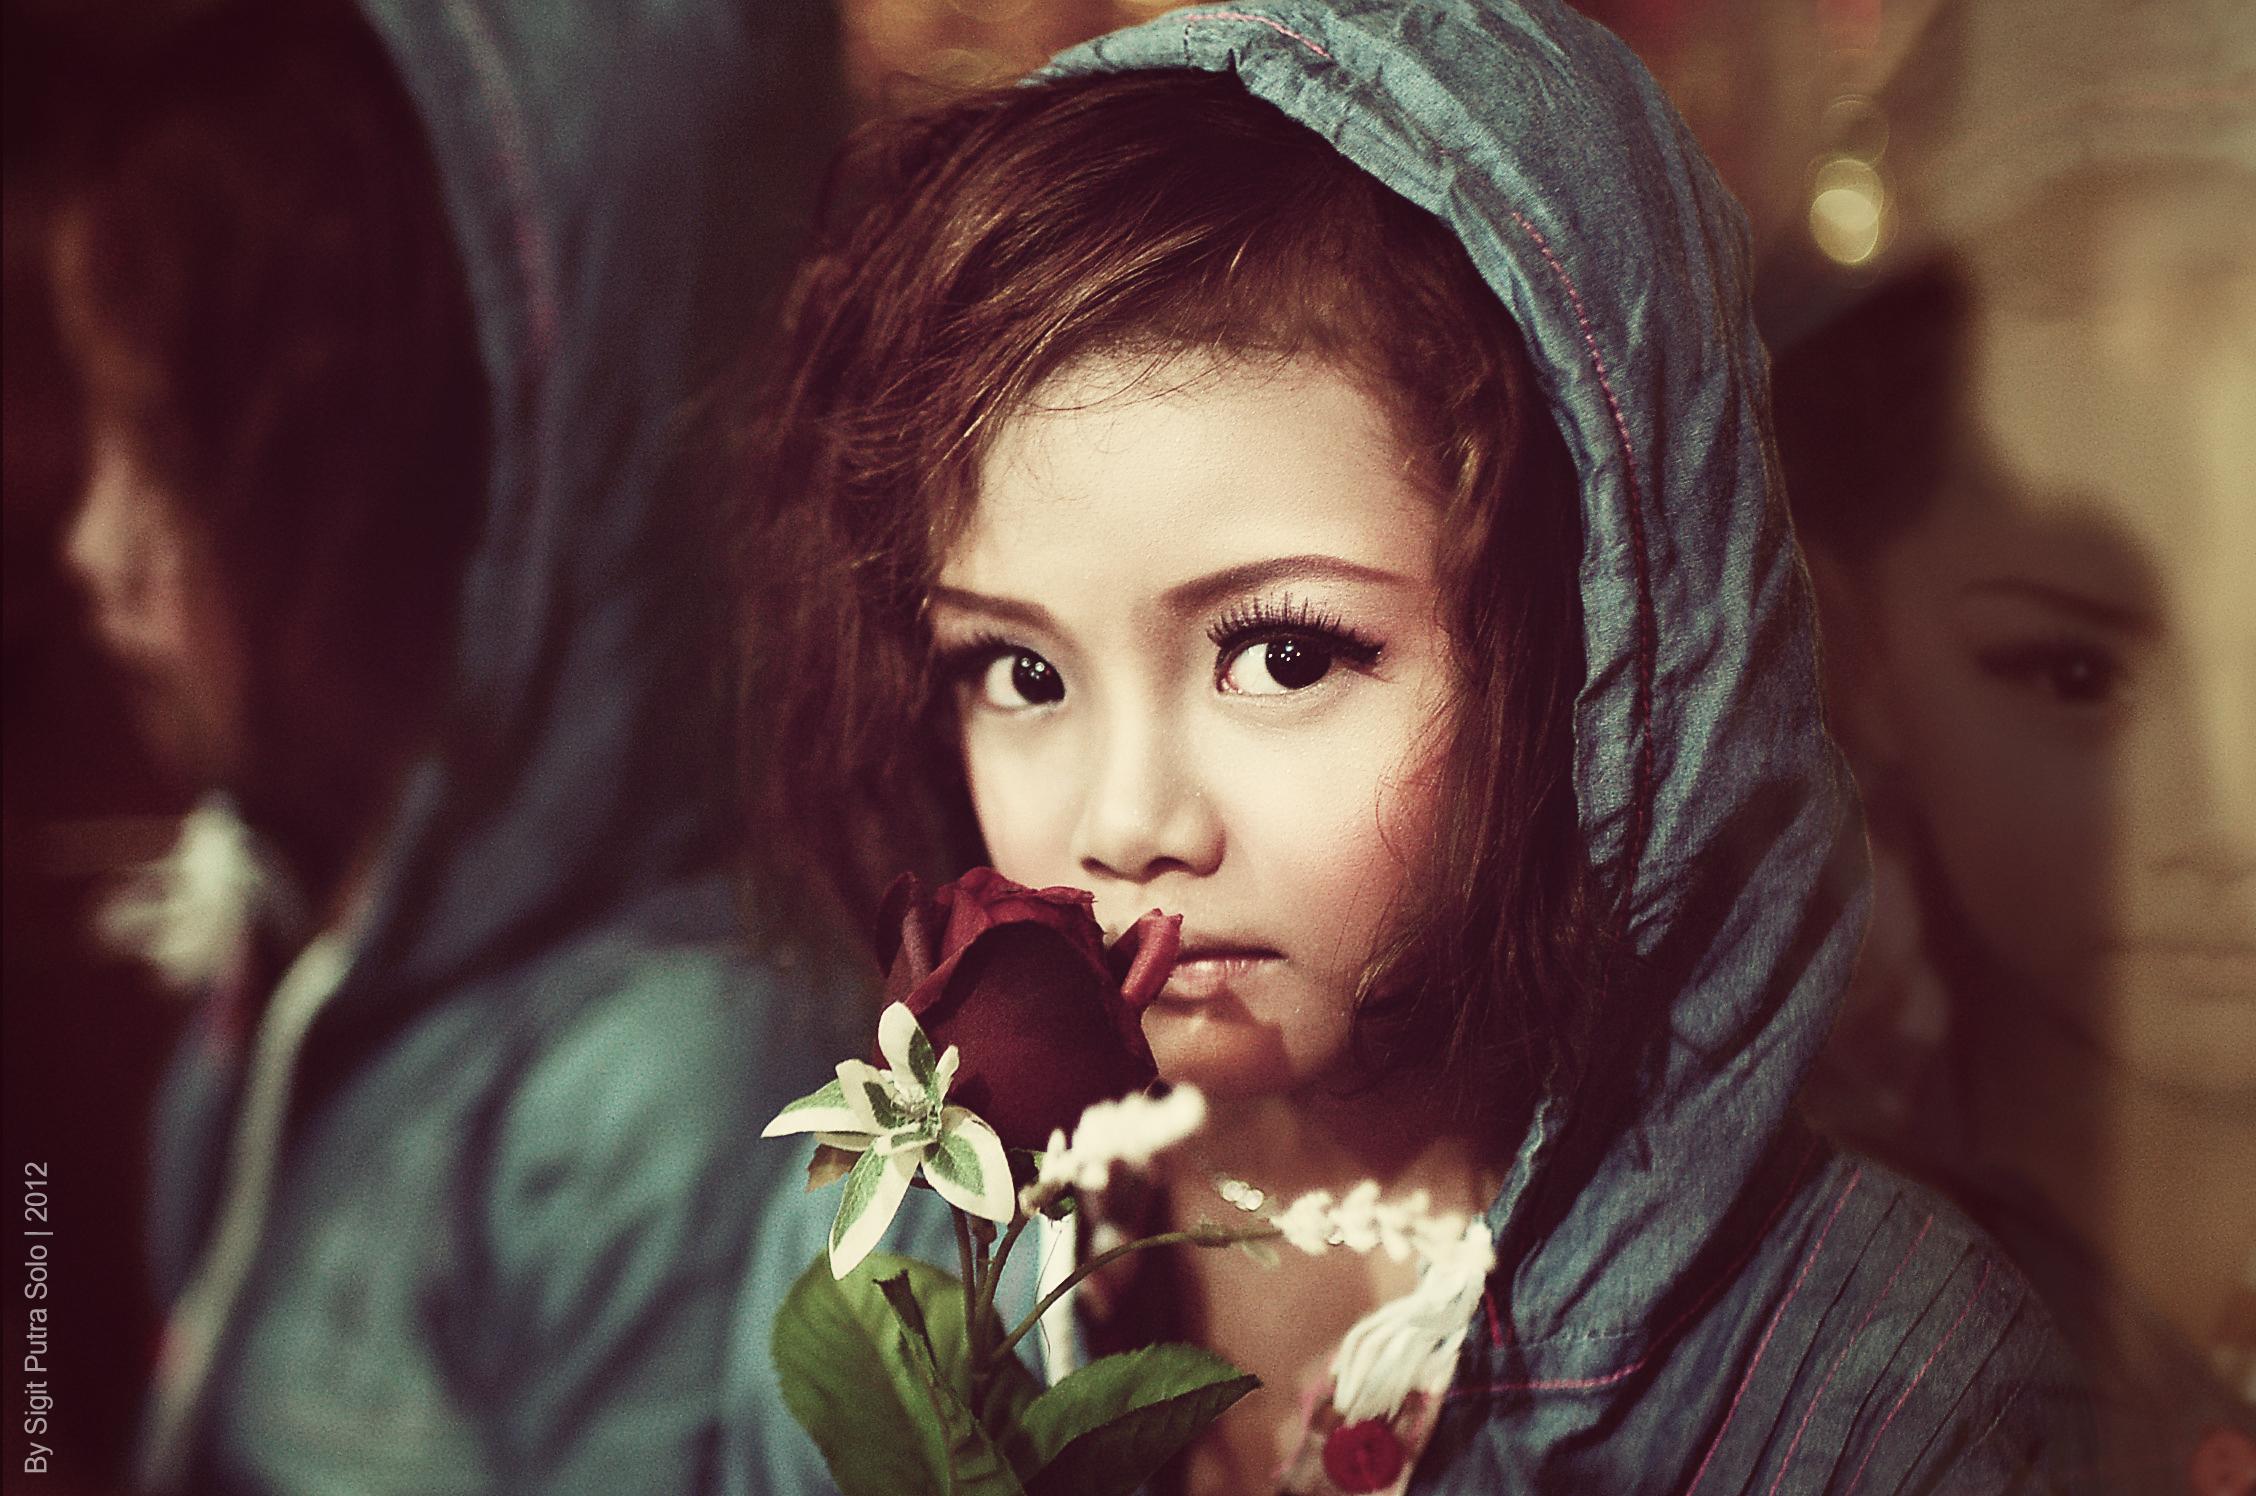 sweet child o mine by SigitPutraSolo